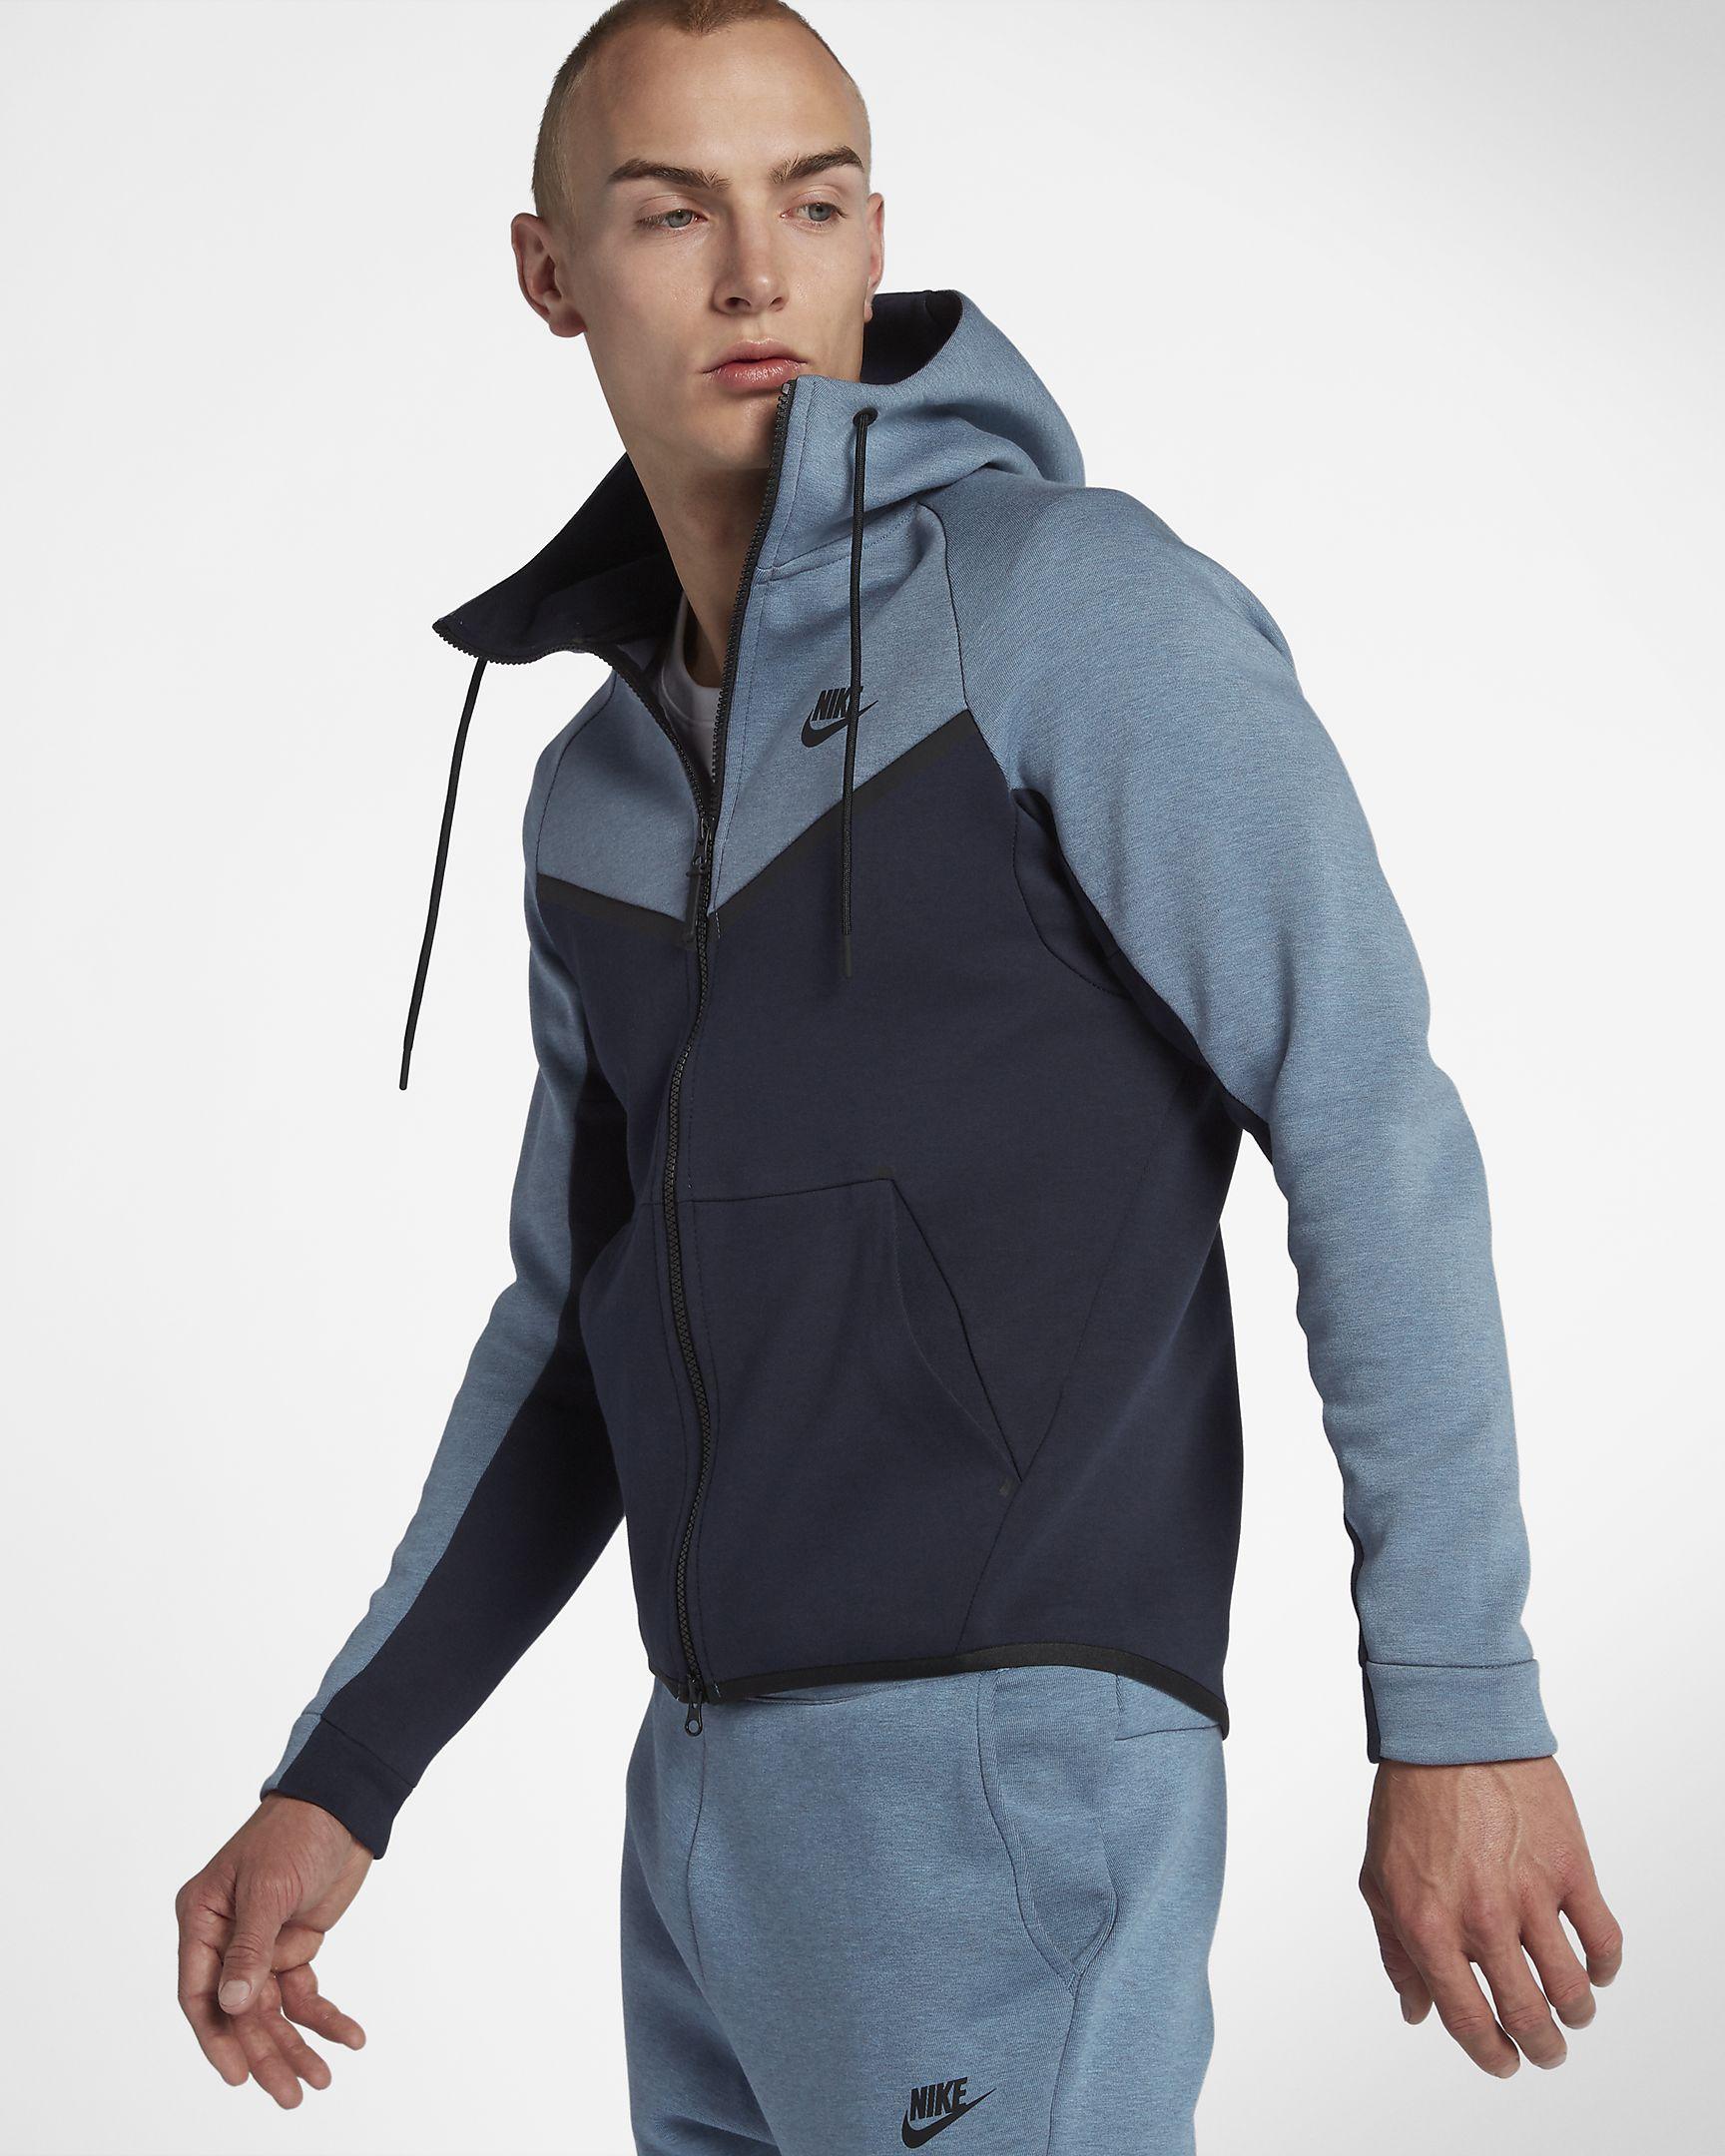 Nike Sportswear Tech Fleece Windrunner Hoodie met rits voor